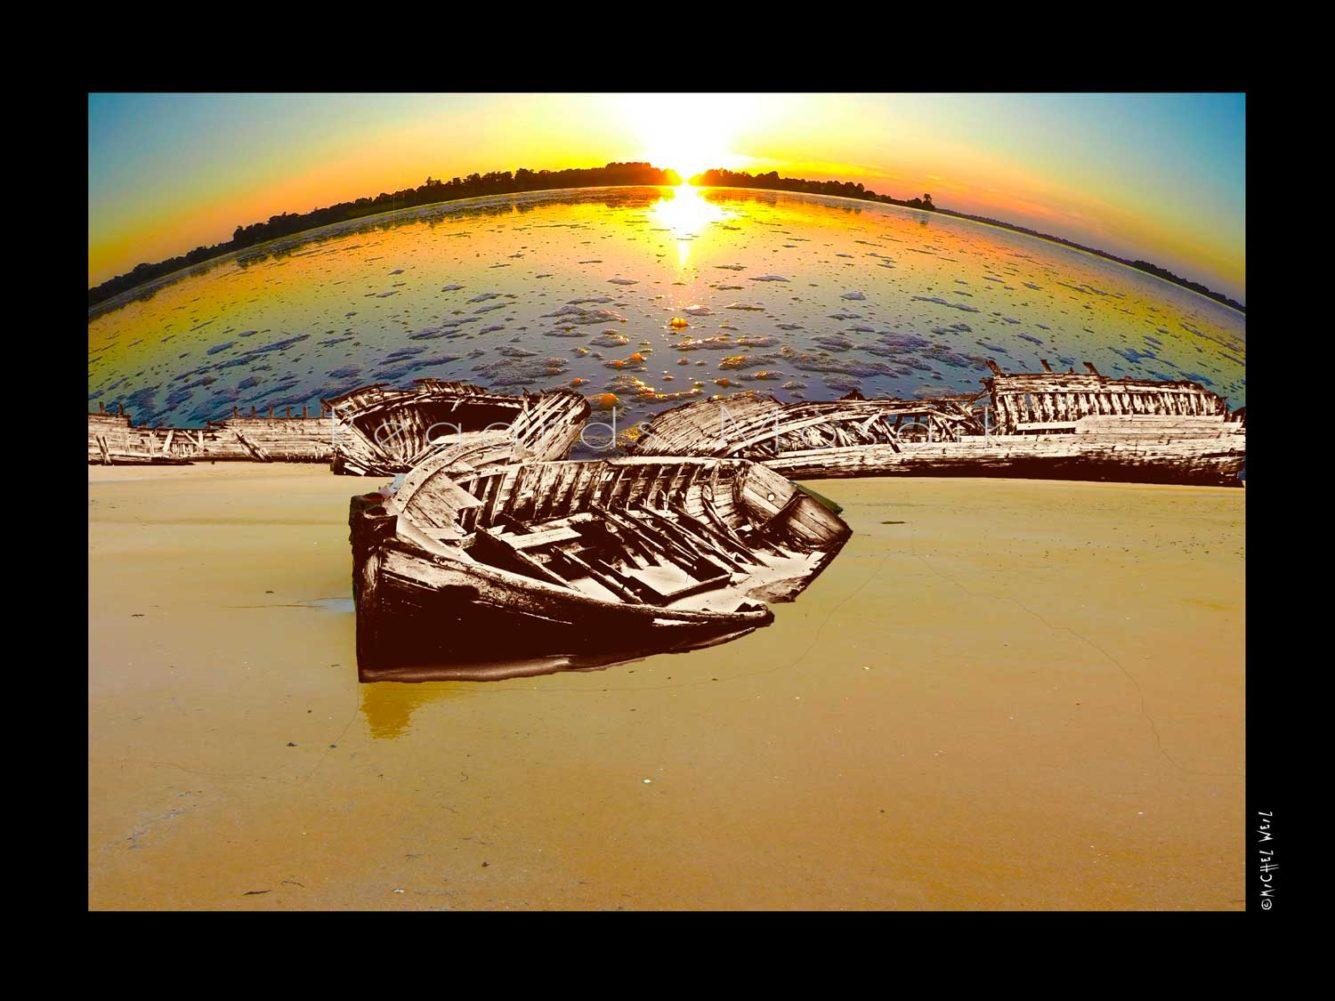 Wrecks on sunset time